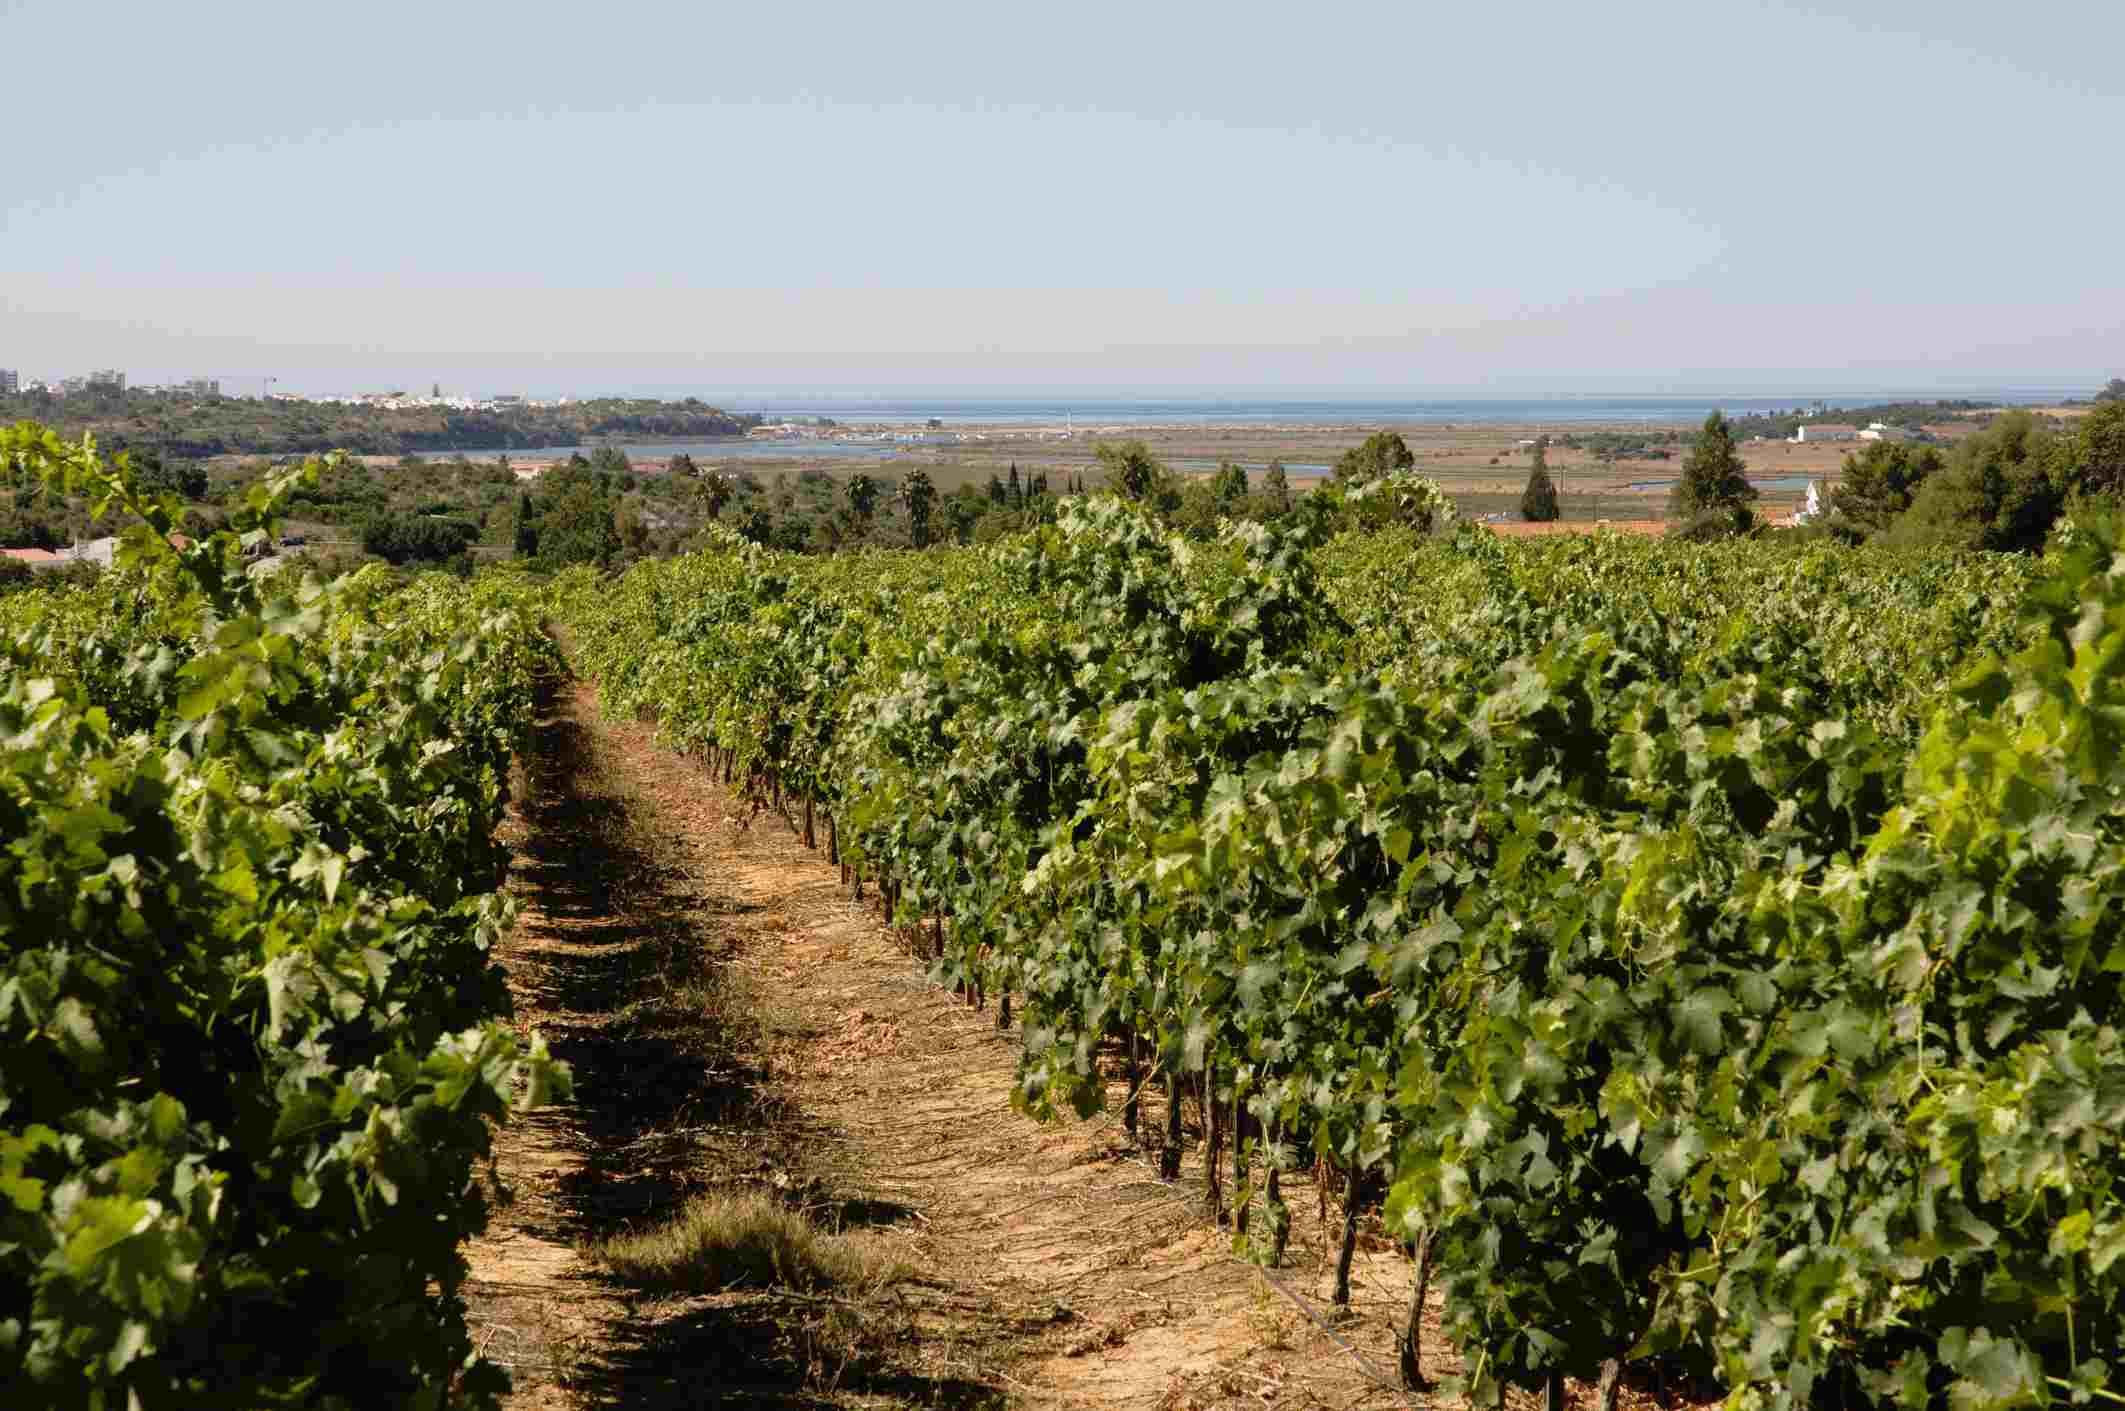 Vineyards of Quinta do Morgado da Torre winery near Portimao, with River Arade and Algarve coastline in background.